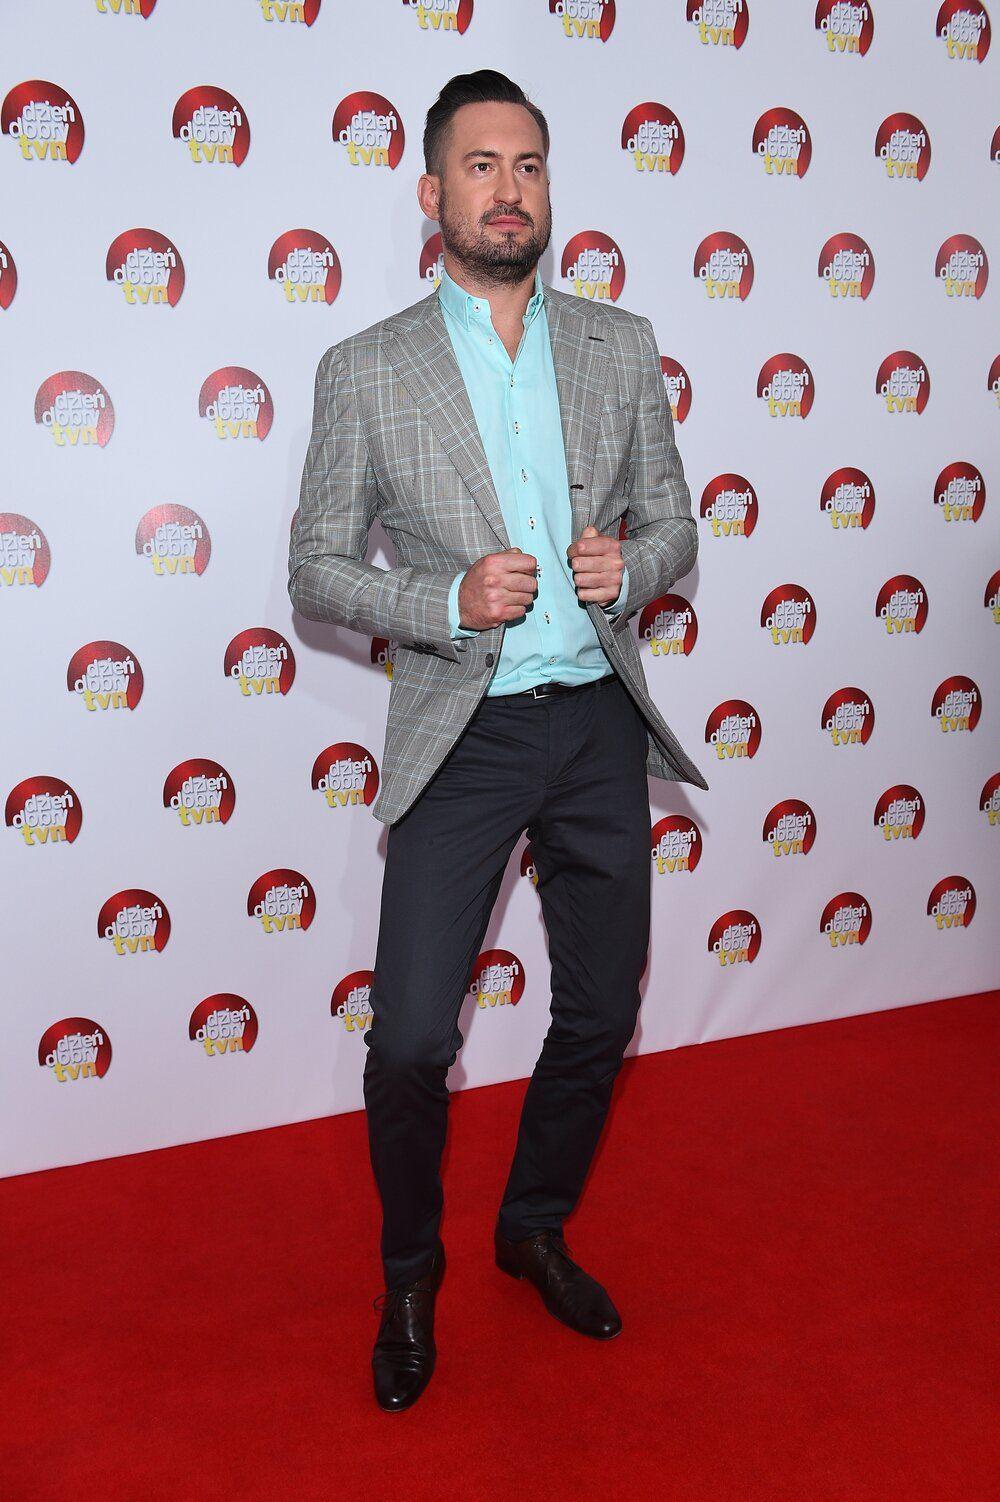 Marcin Prokop Mietowa Koszula Szara Marynarka I Granatowe Spodnie Men S Blazer Mens Fashion Men